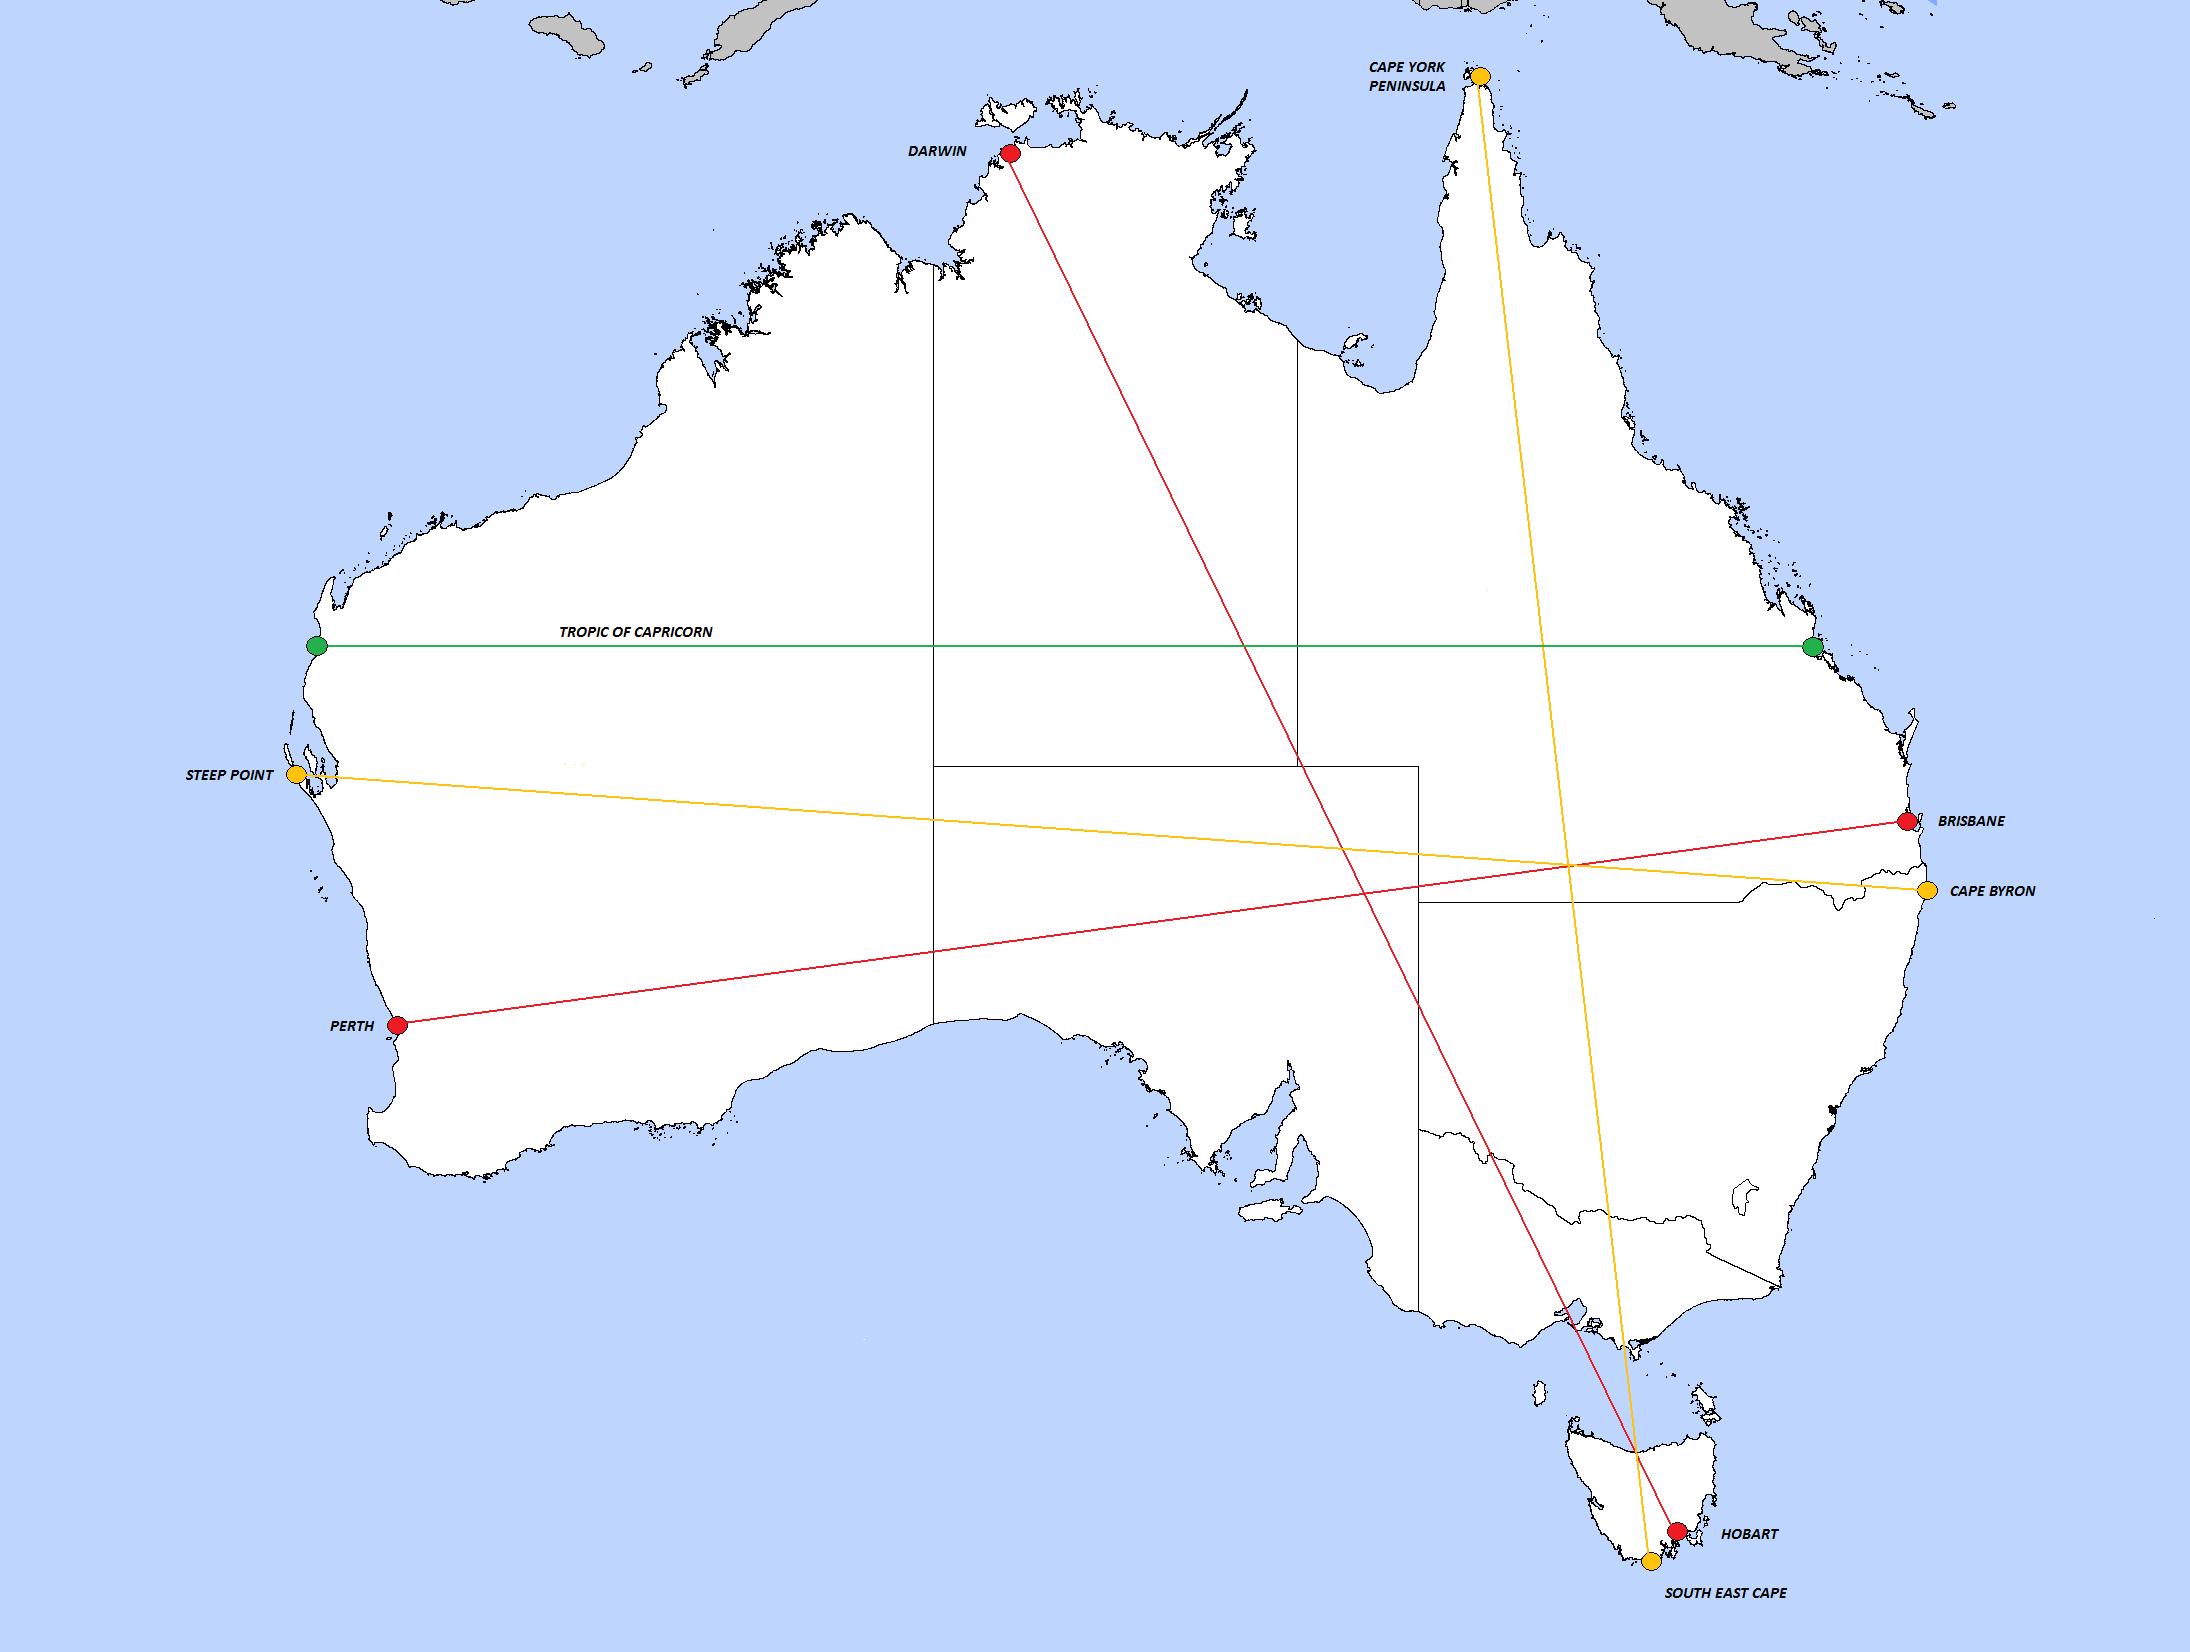 Australia Map Tropic Of Capricorn.Tropic Of Capricorn Australia Map